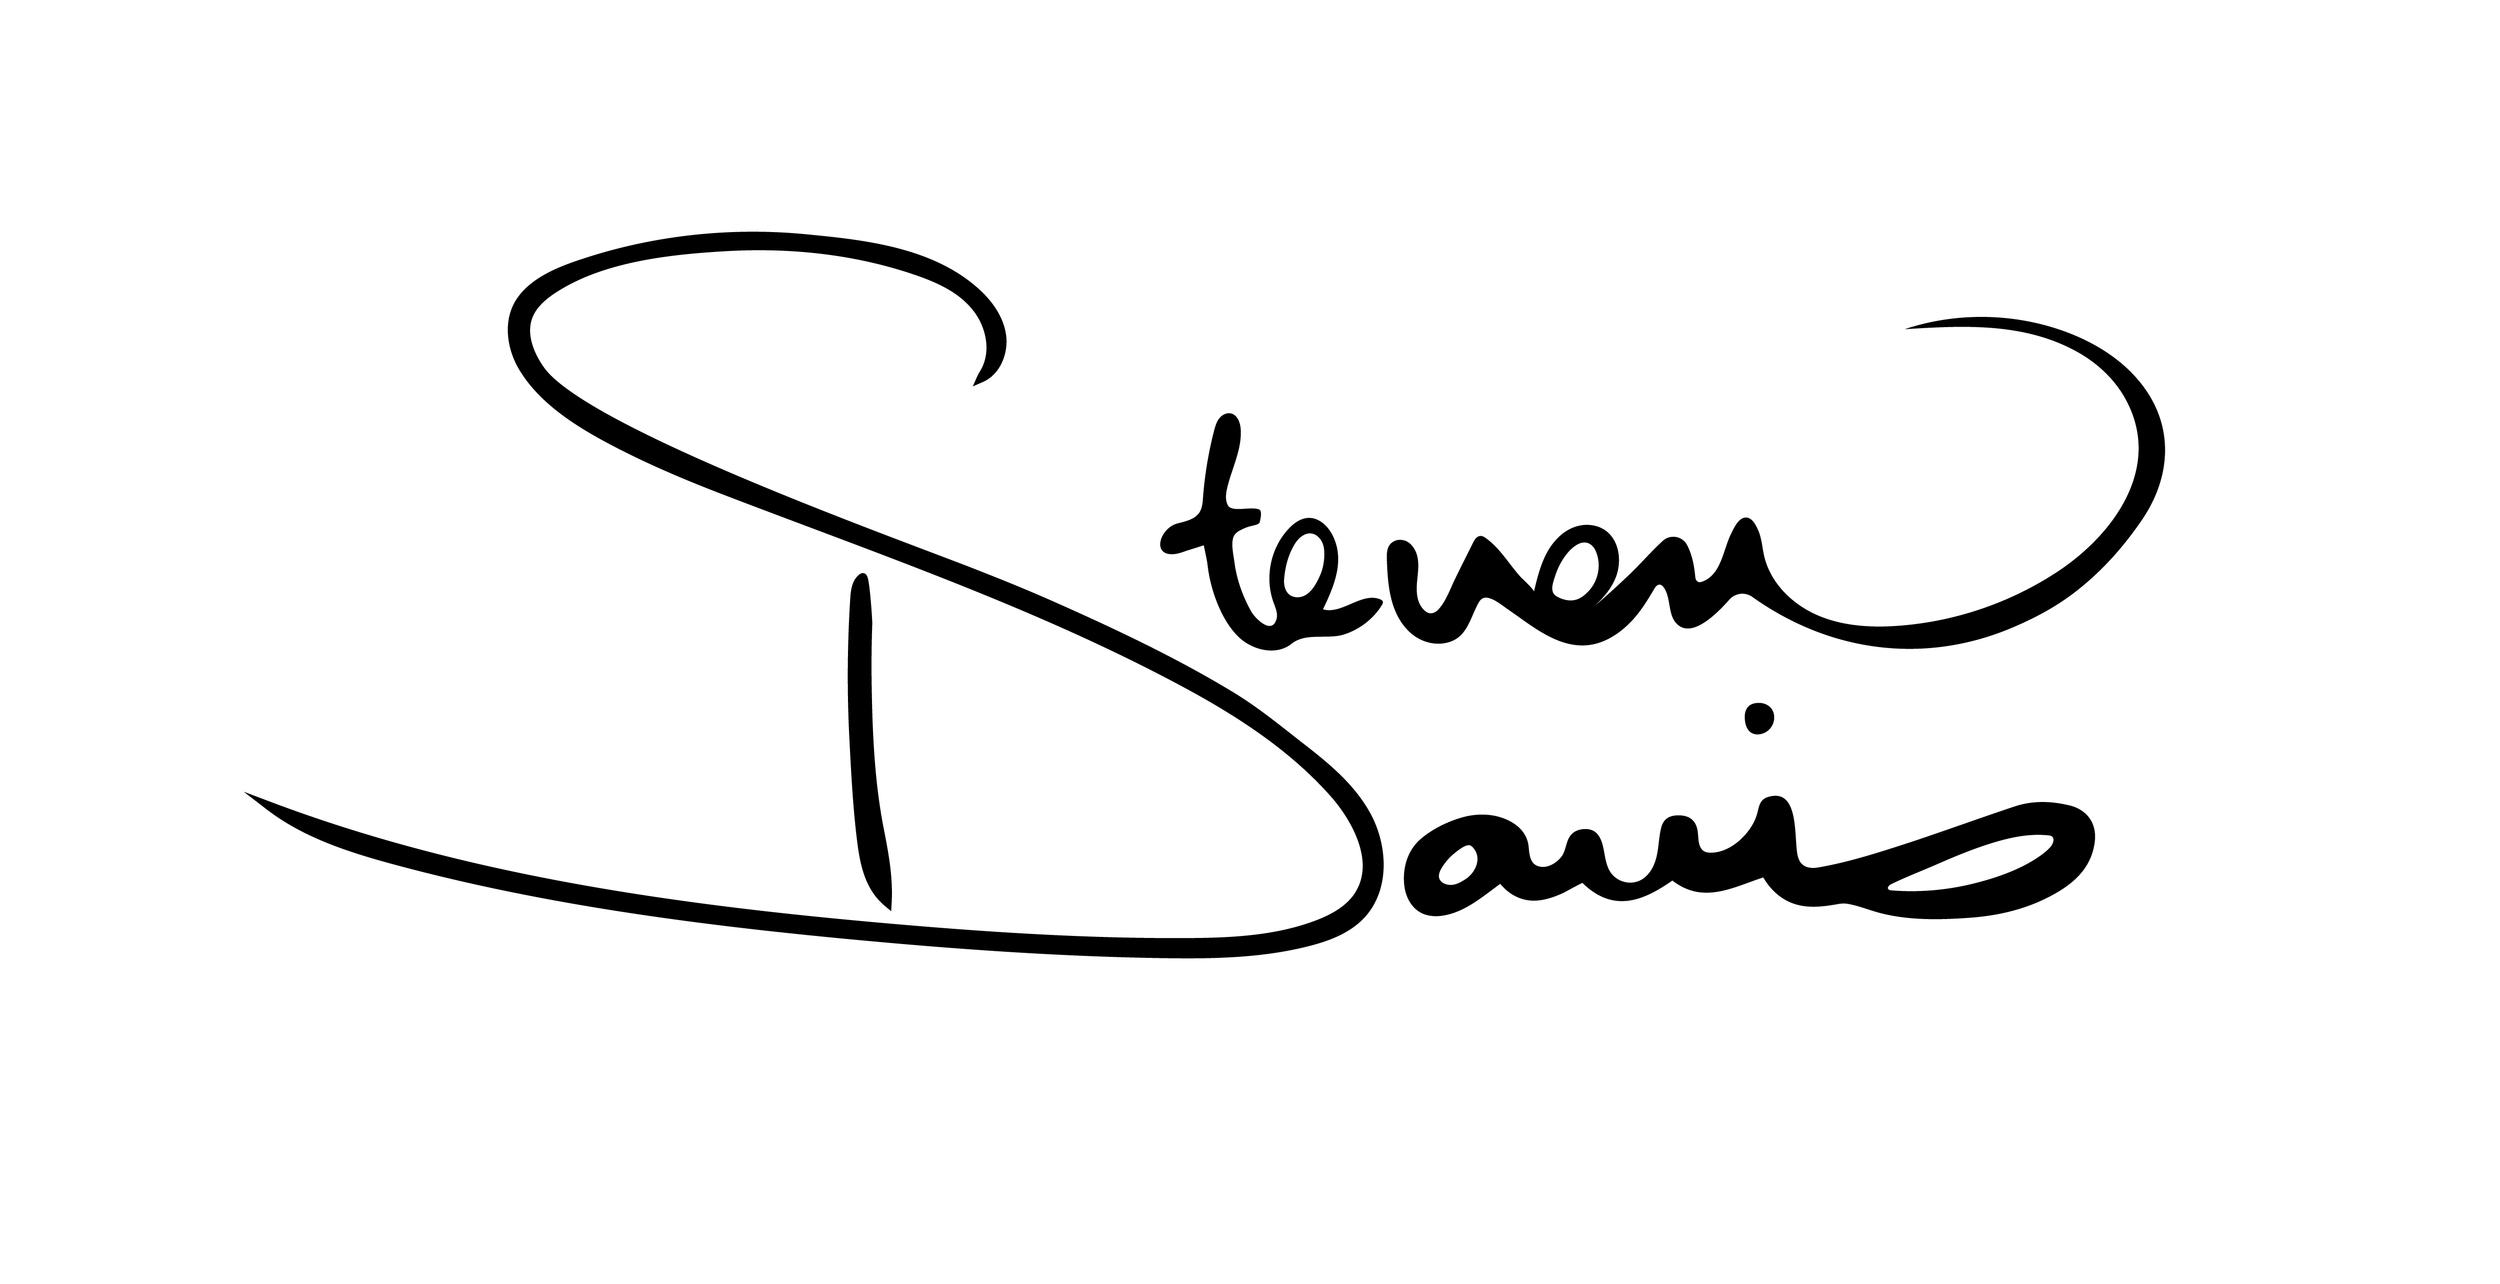 Steven davis final logo -01.jpg